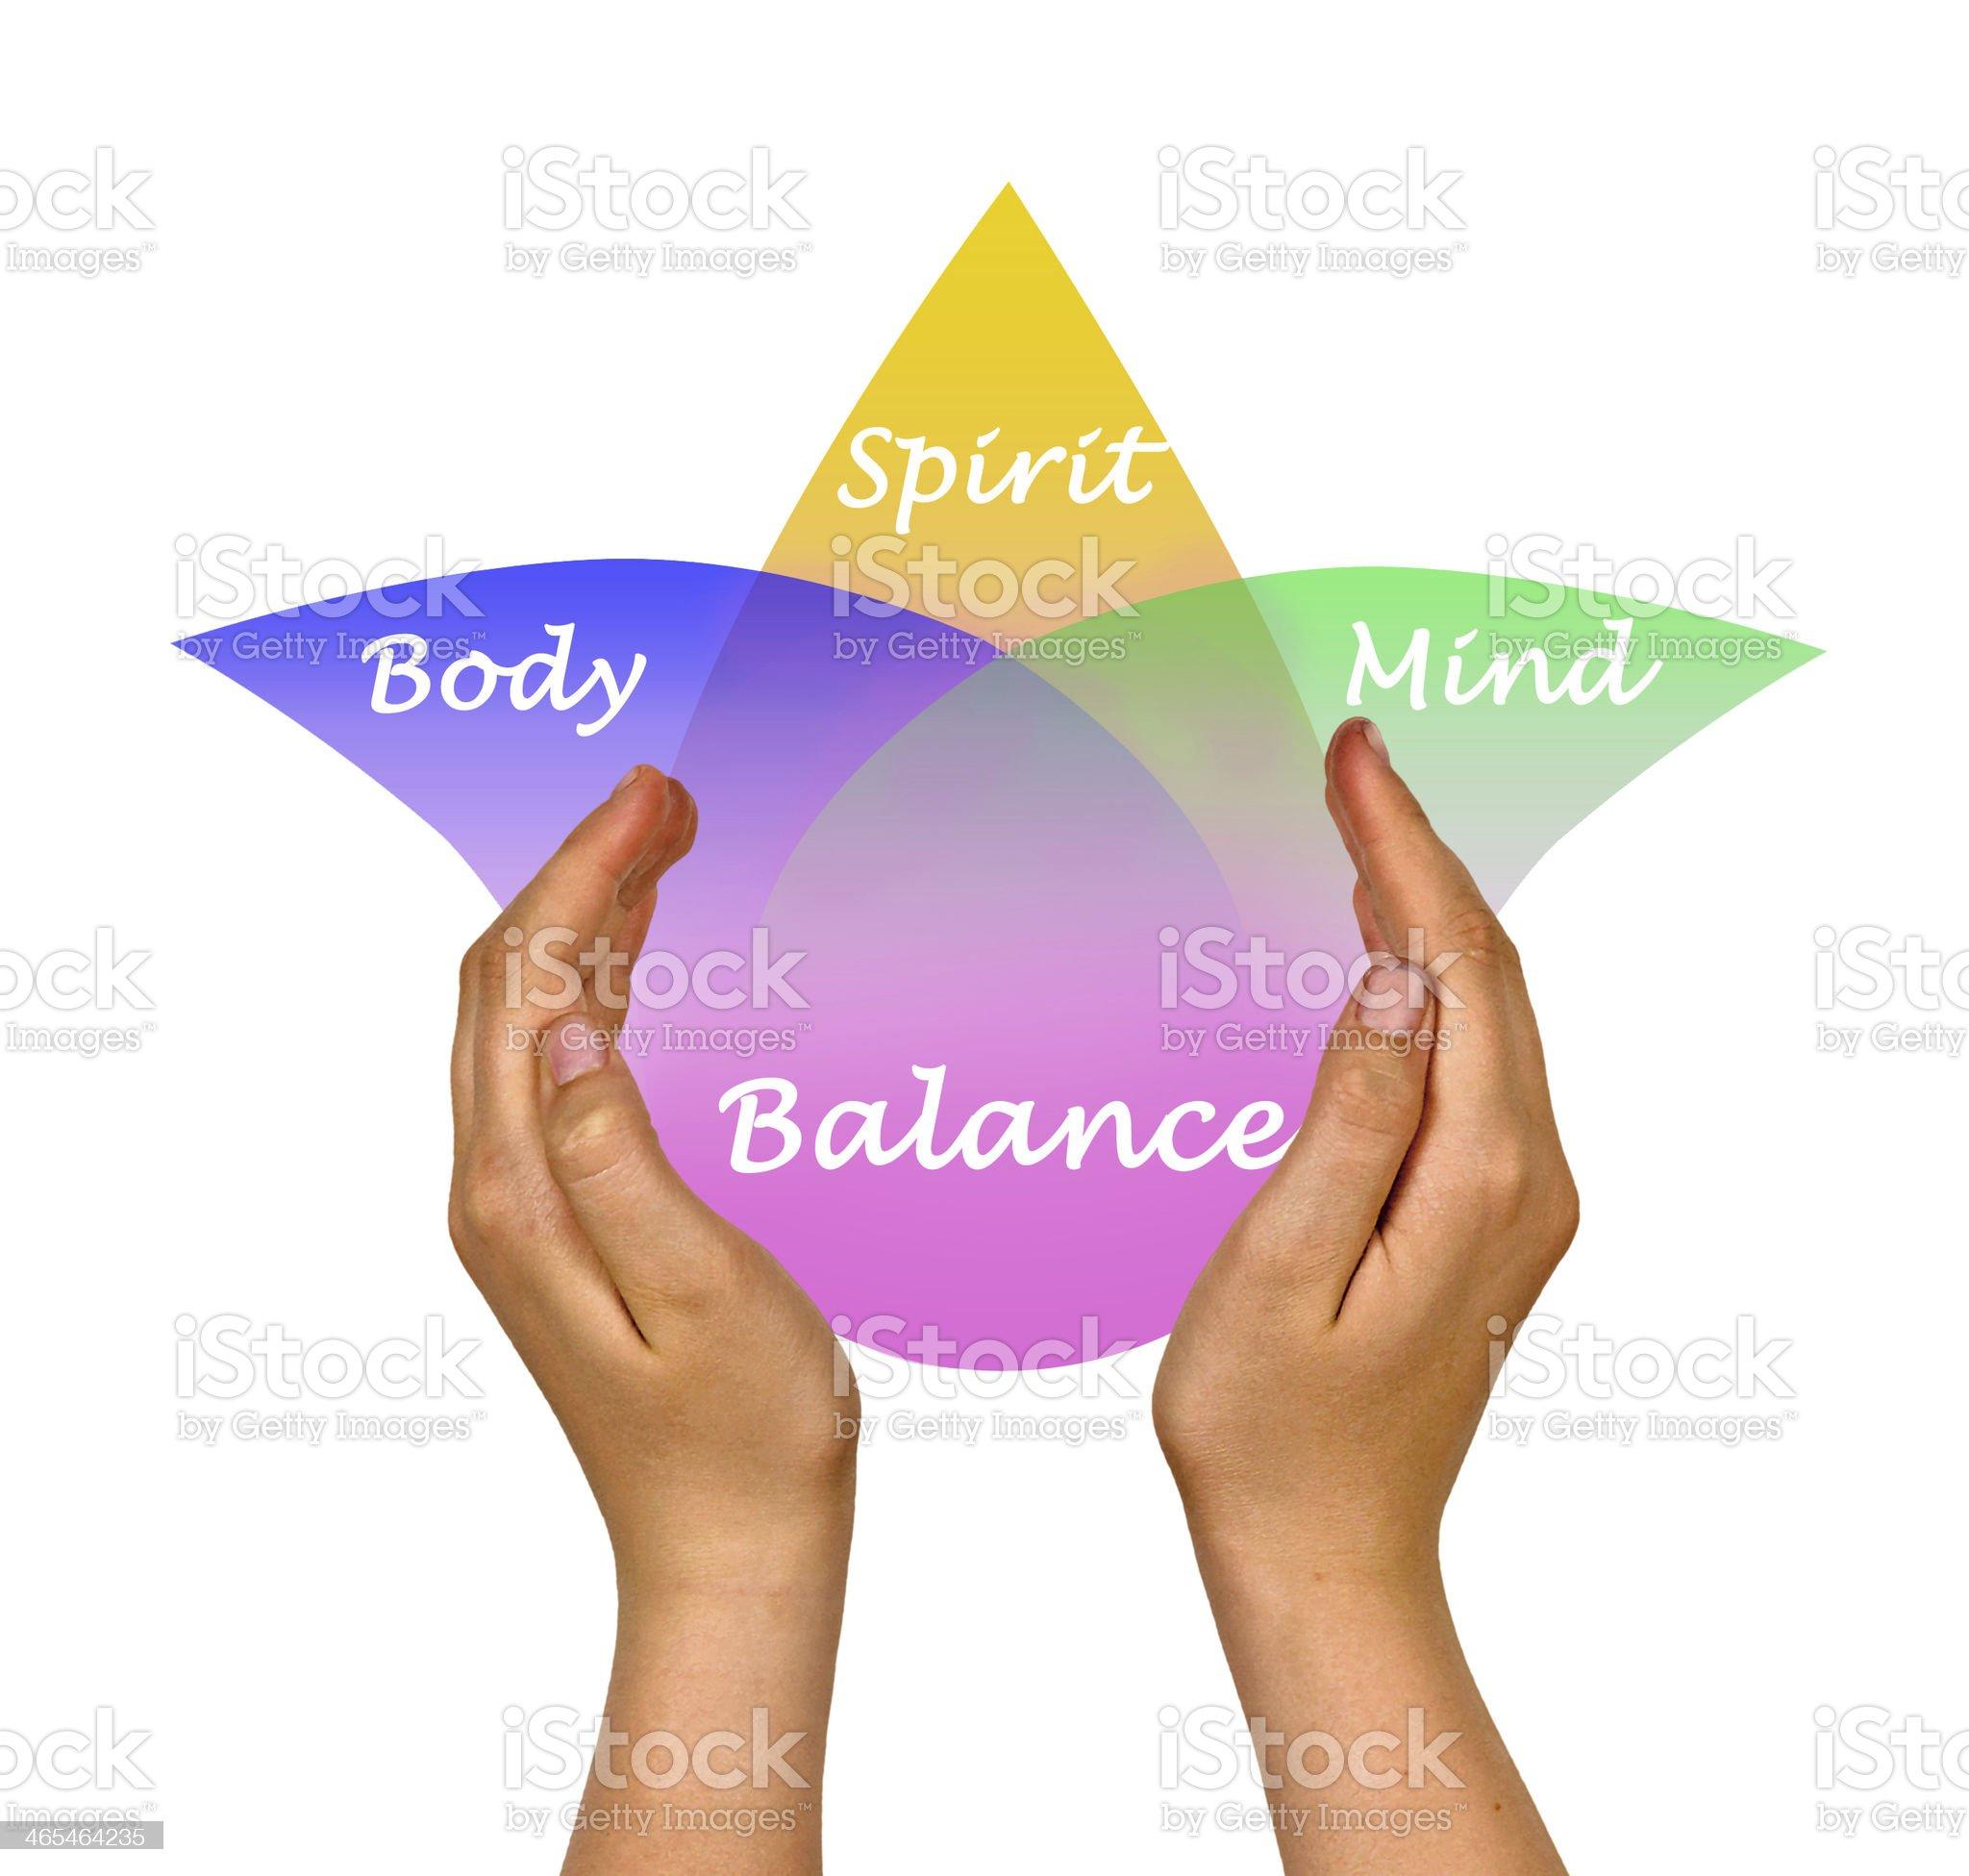 Body, spirit, mind Balance royalty-free stock photo